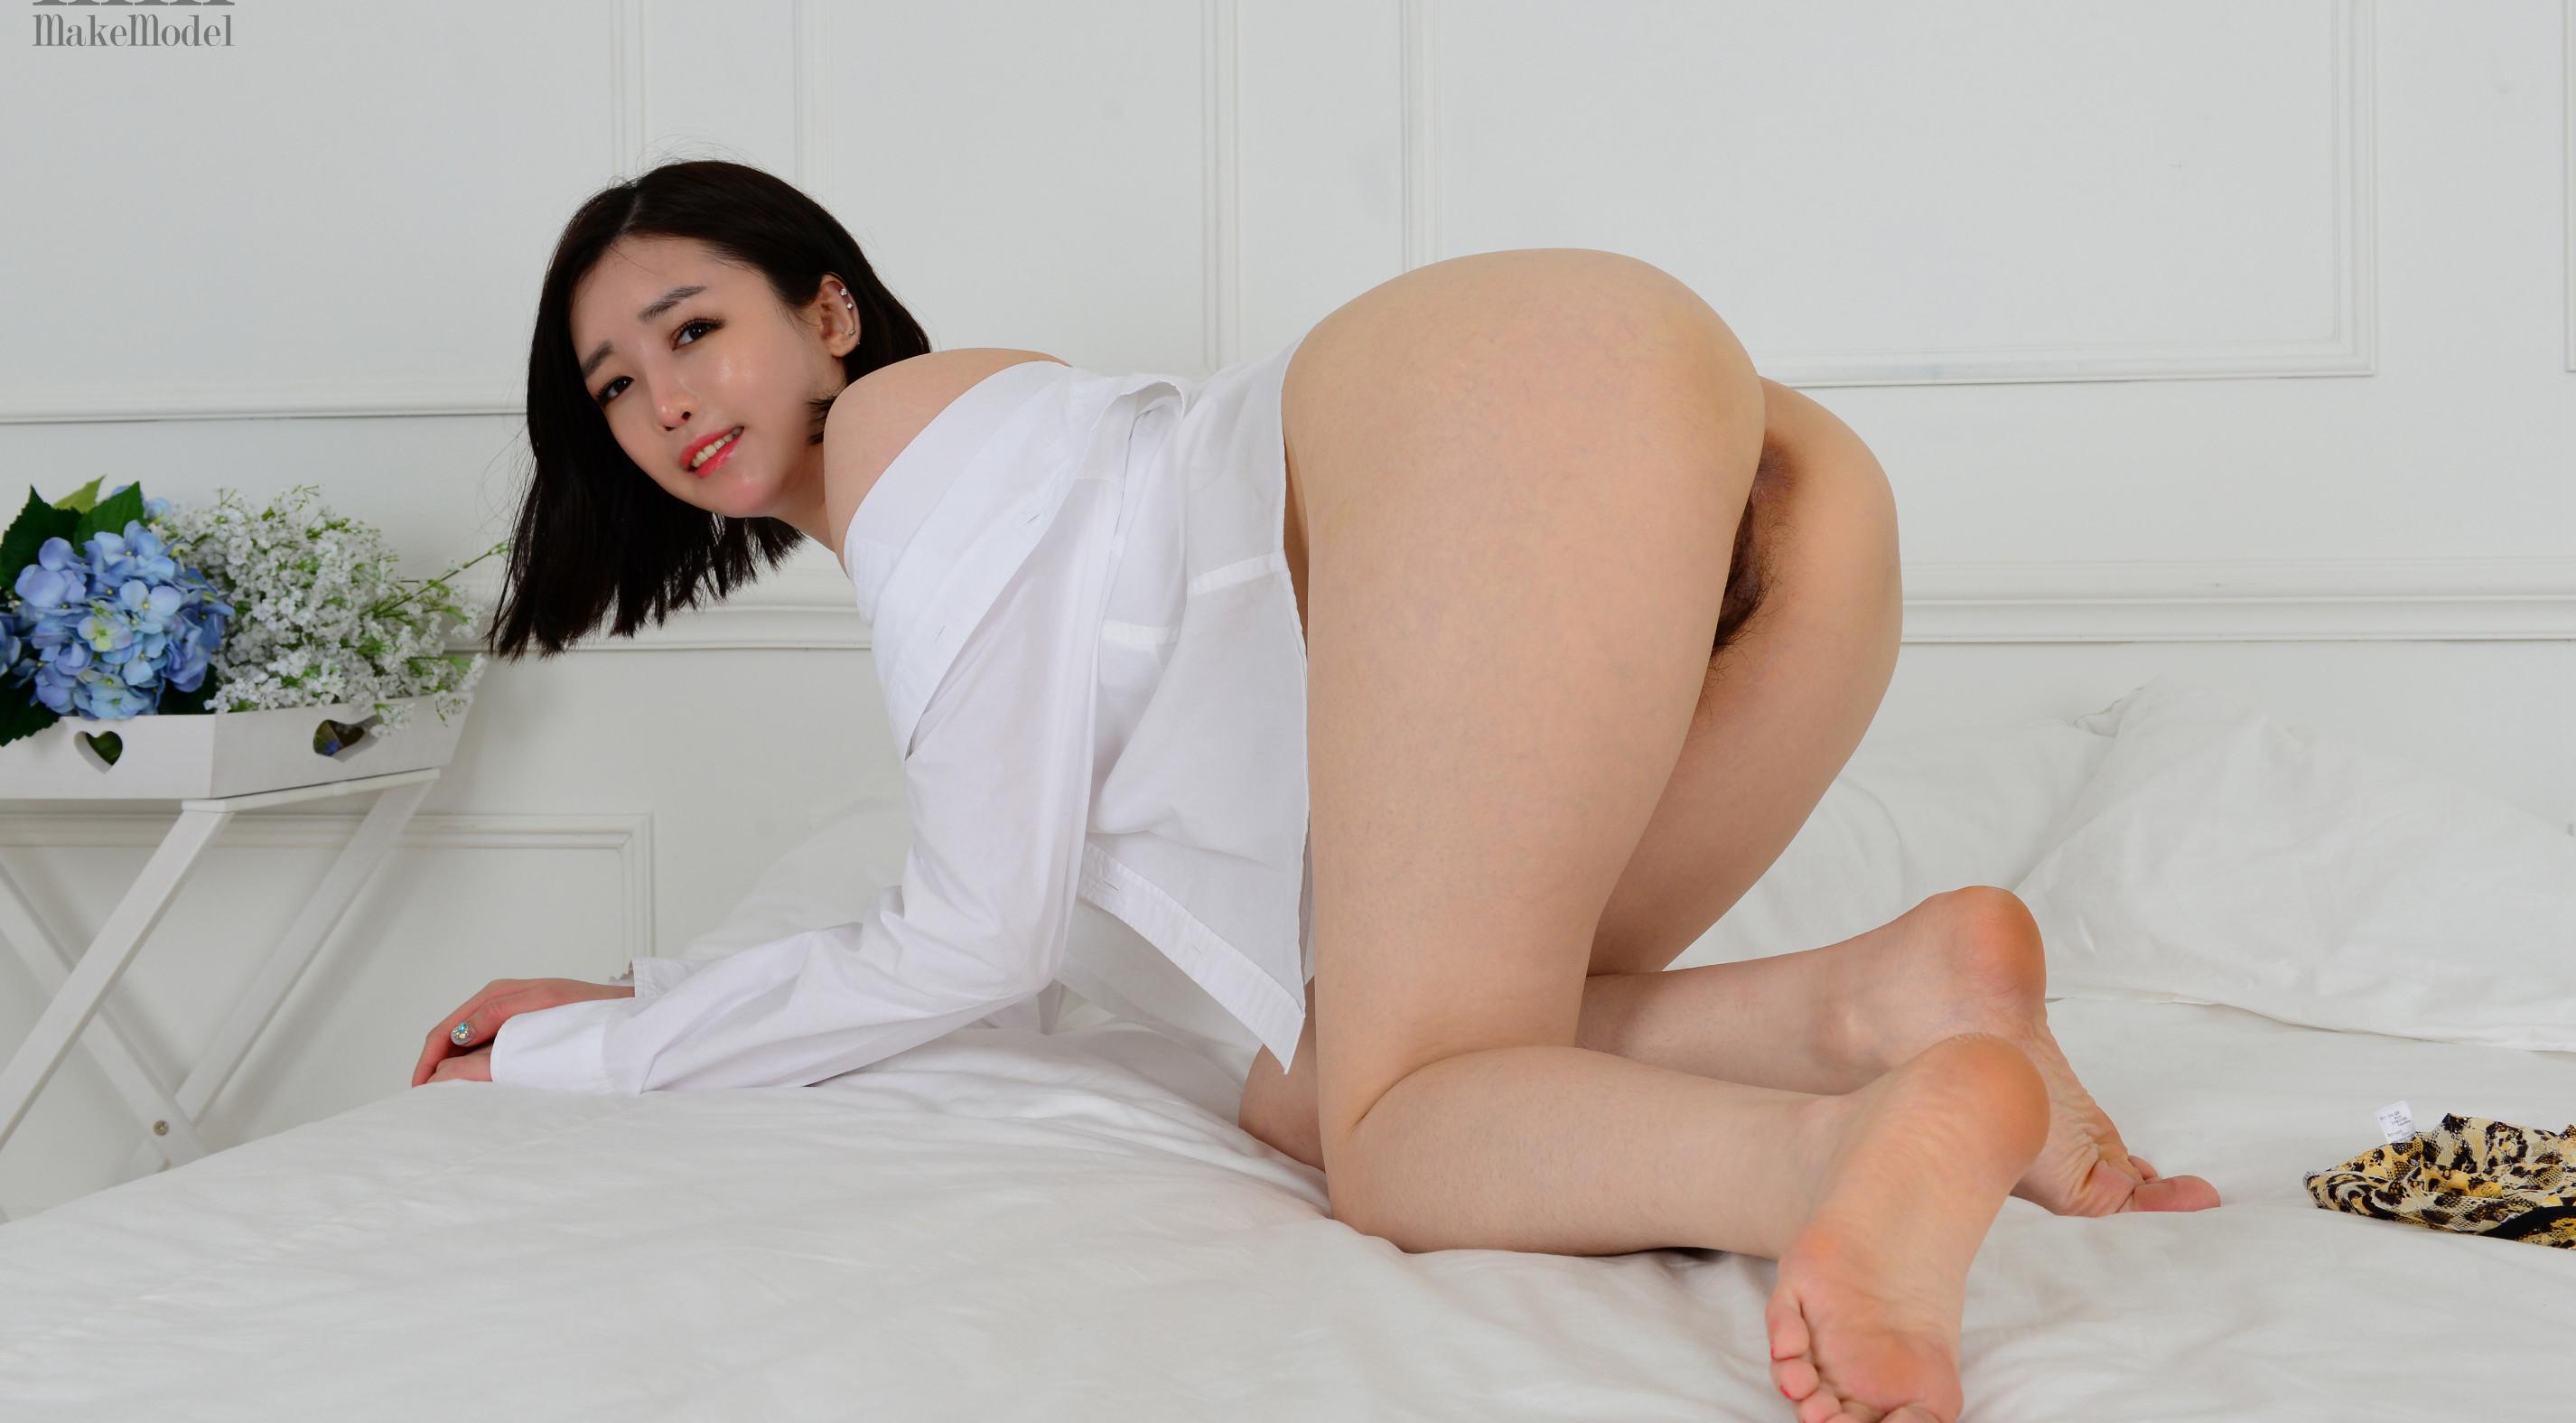 Азиатка раздвинула ноги показав пушистую пизду